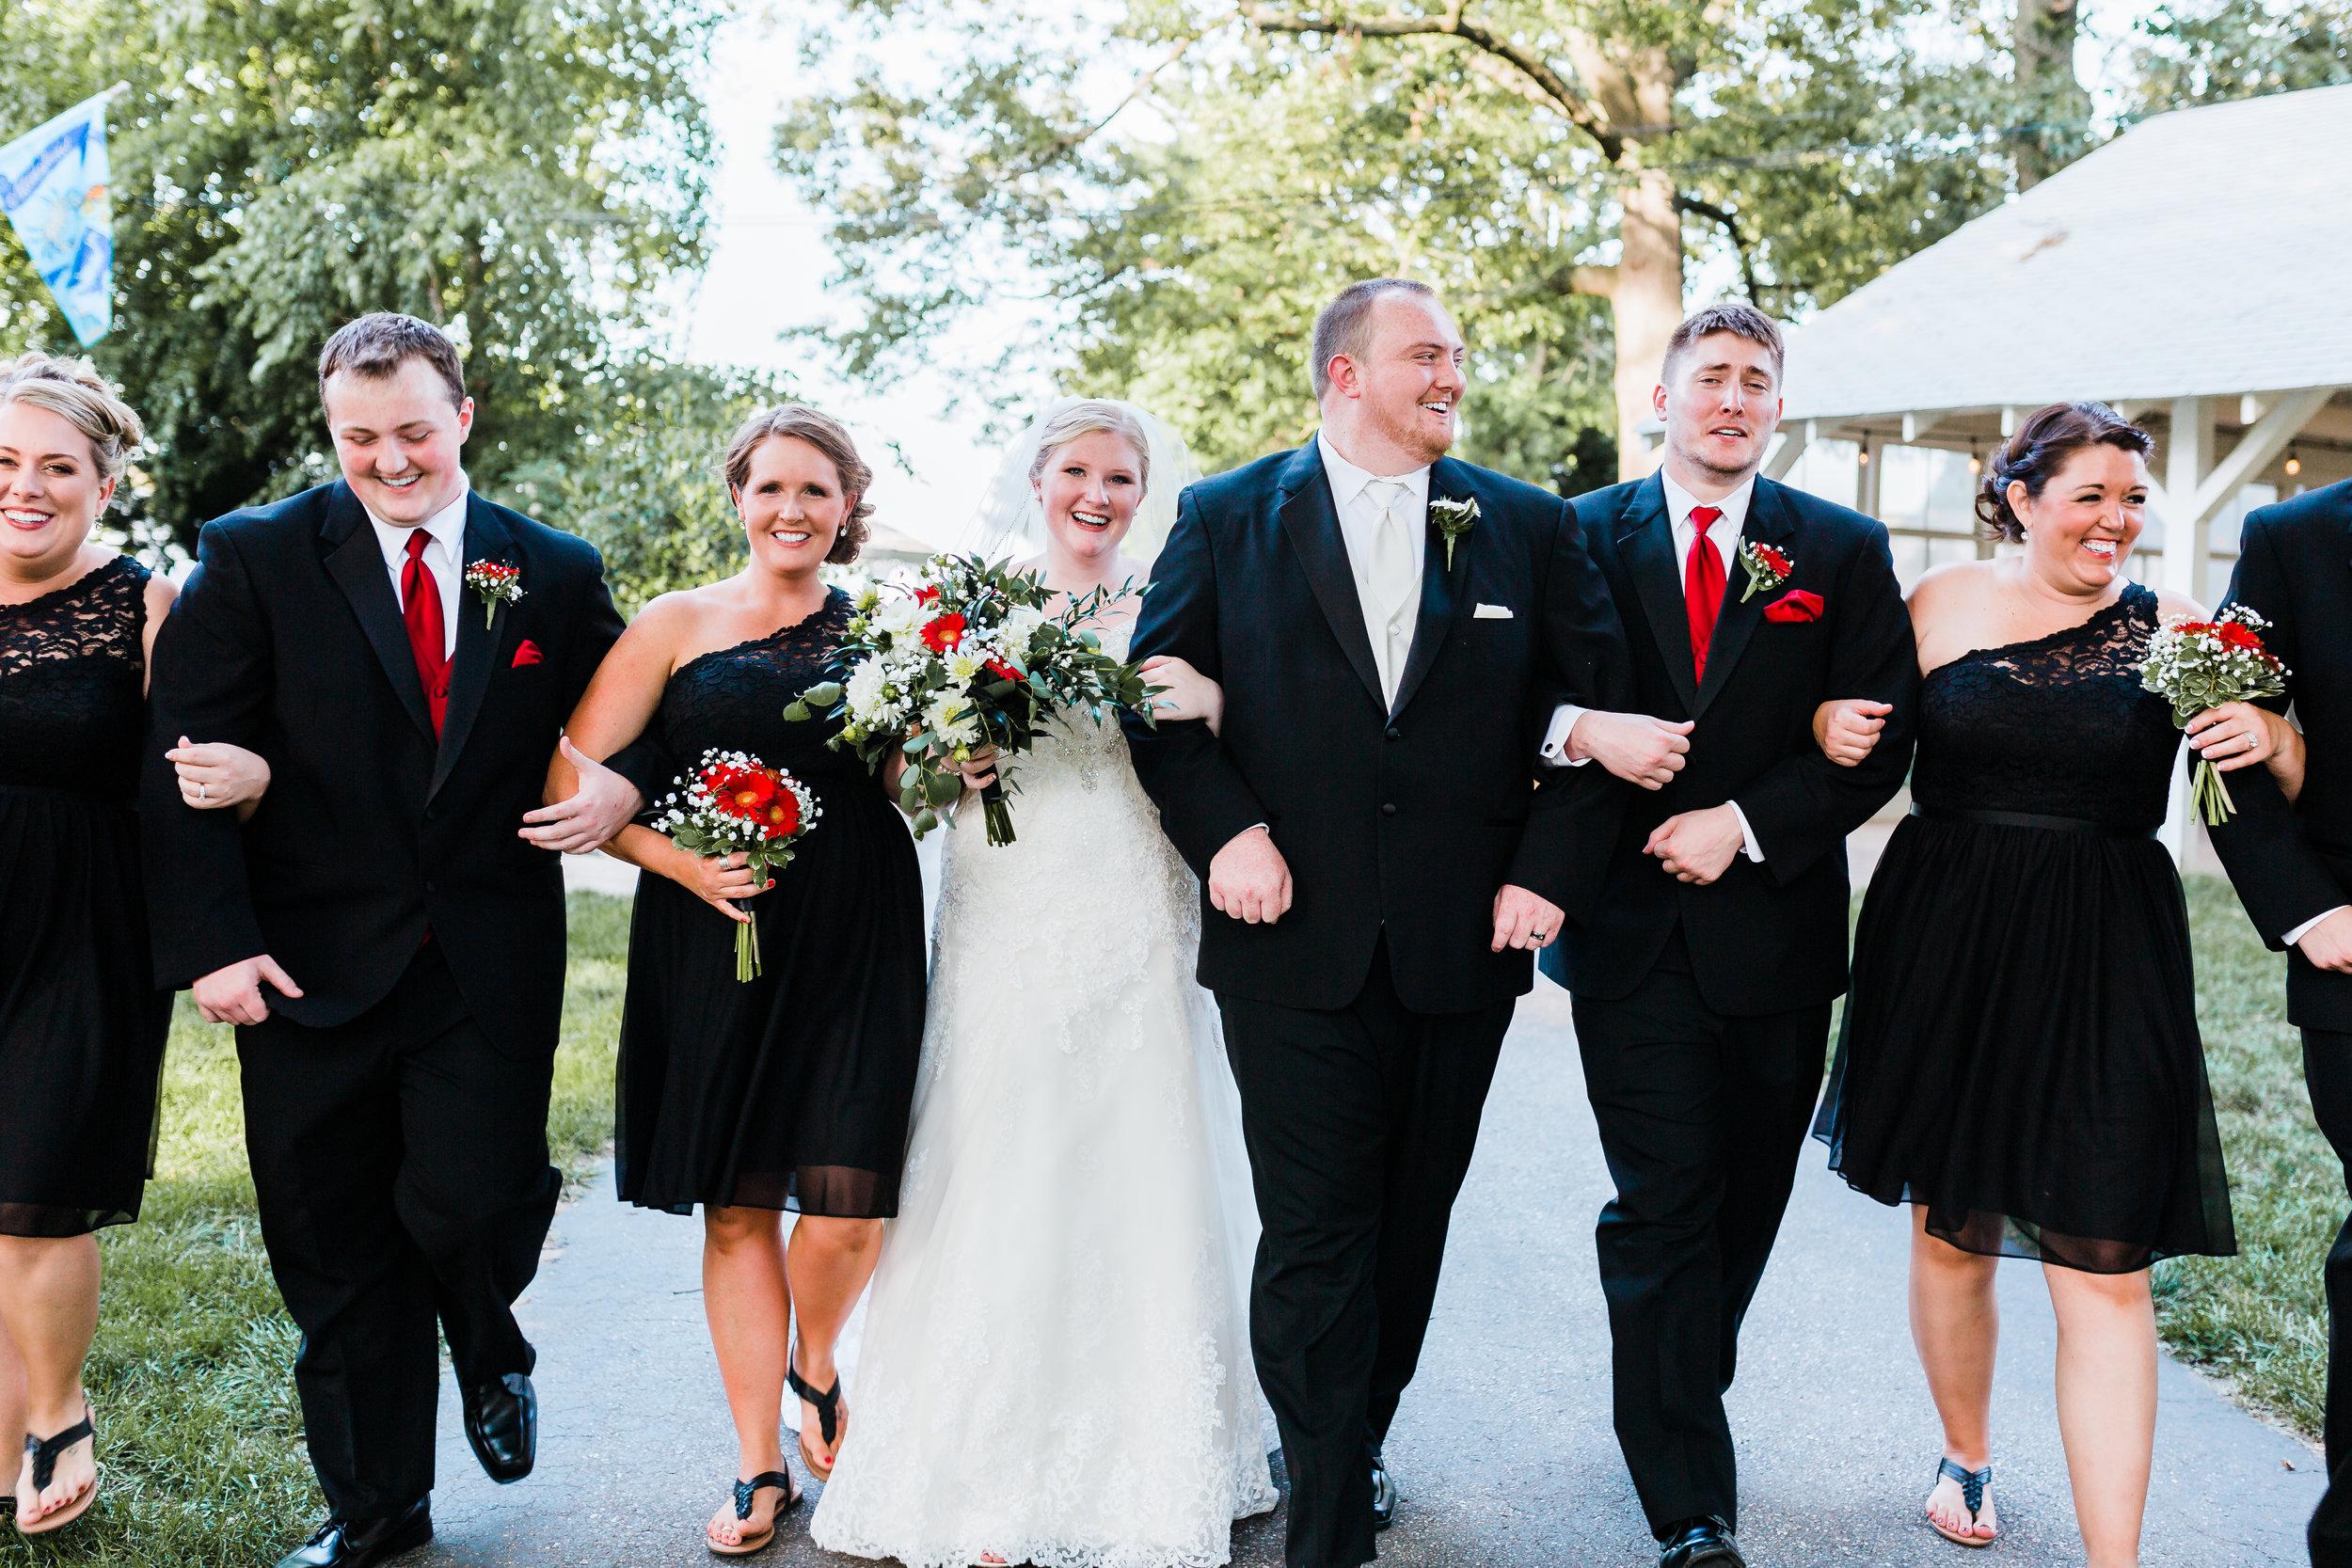 bridal party photos at bayside wedding in pasadena maryland - md wedding photographer